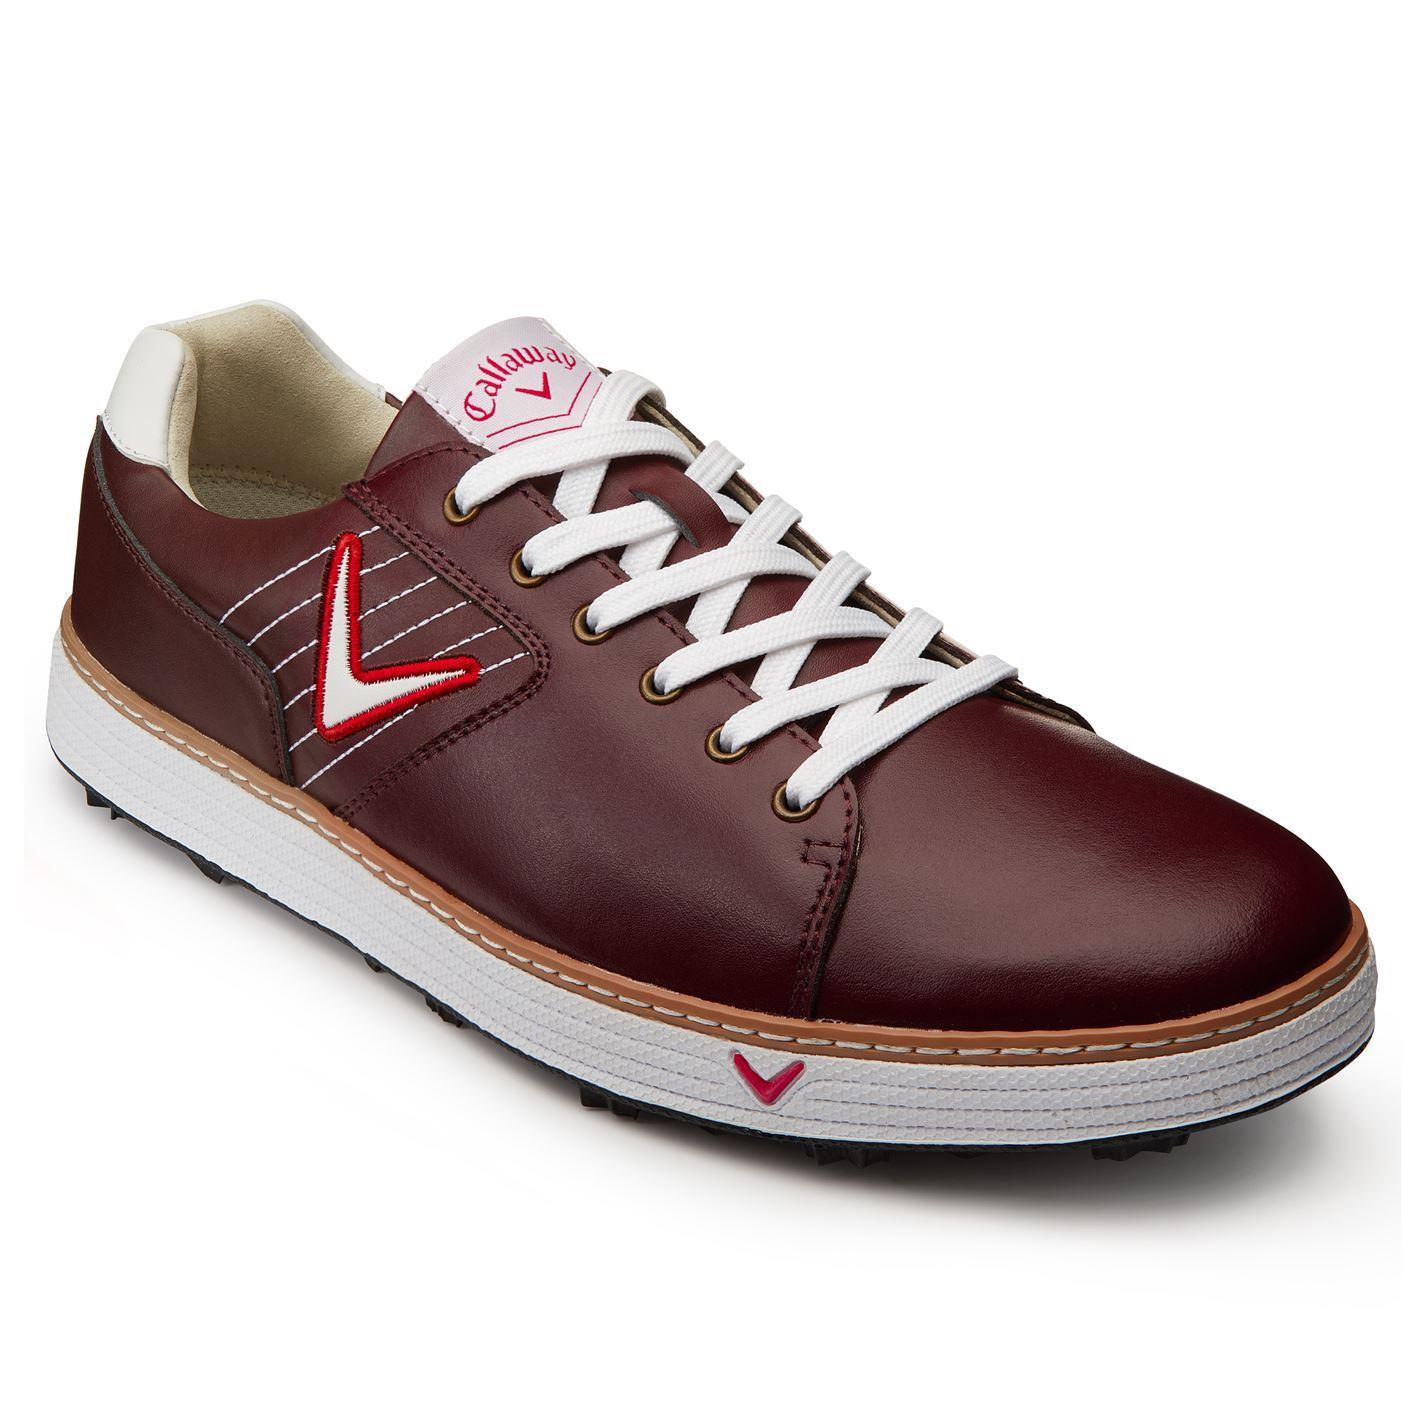 Callaway-Delmar-Urban-Golf-Shoes-Mens-Spikeless-Footwear thumbnail 5